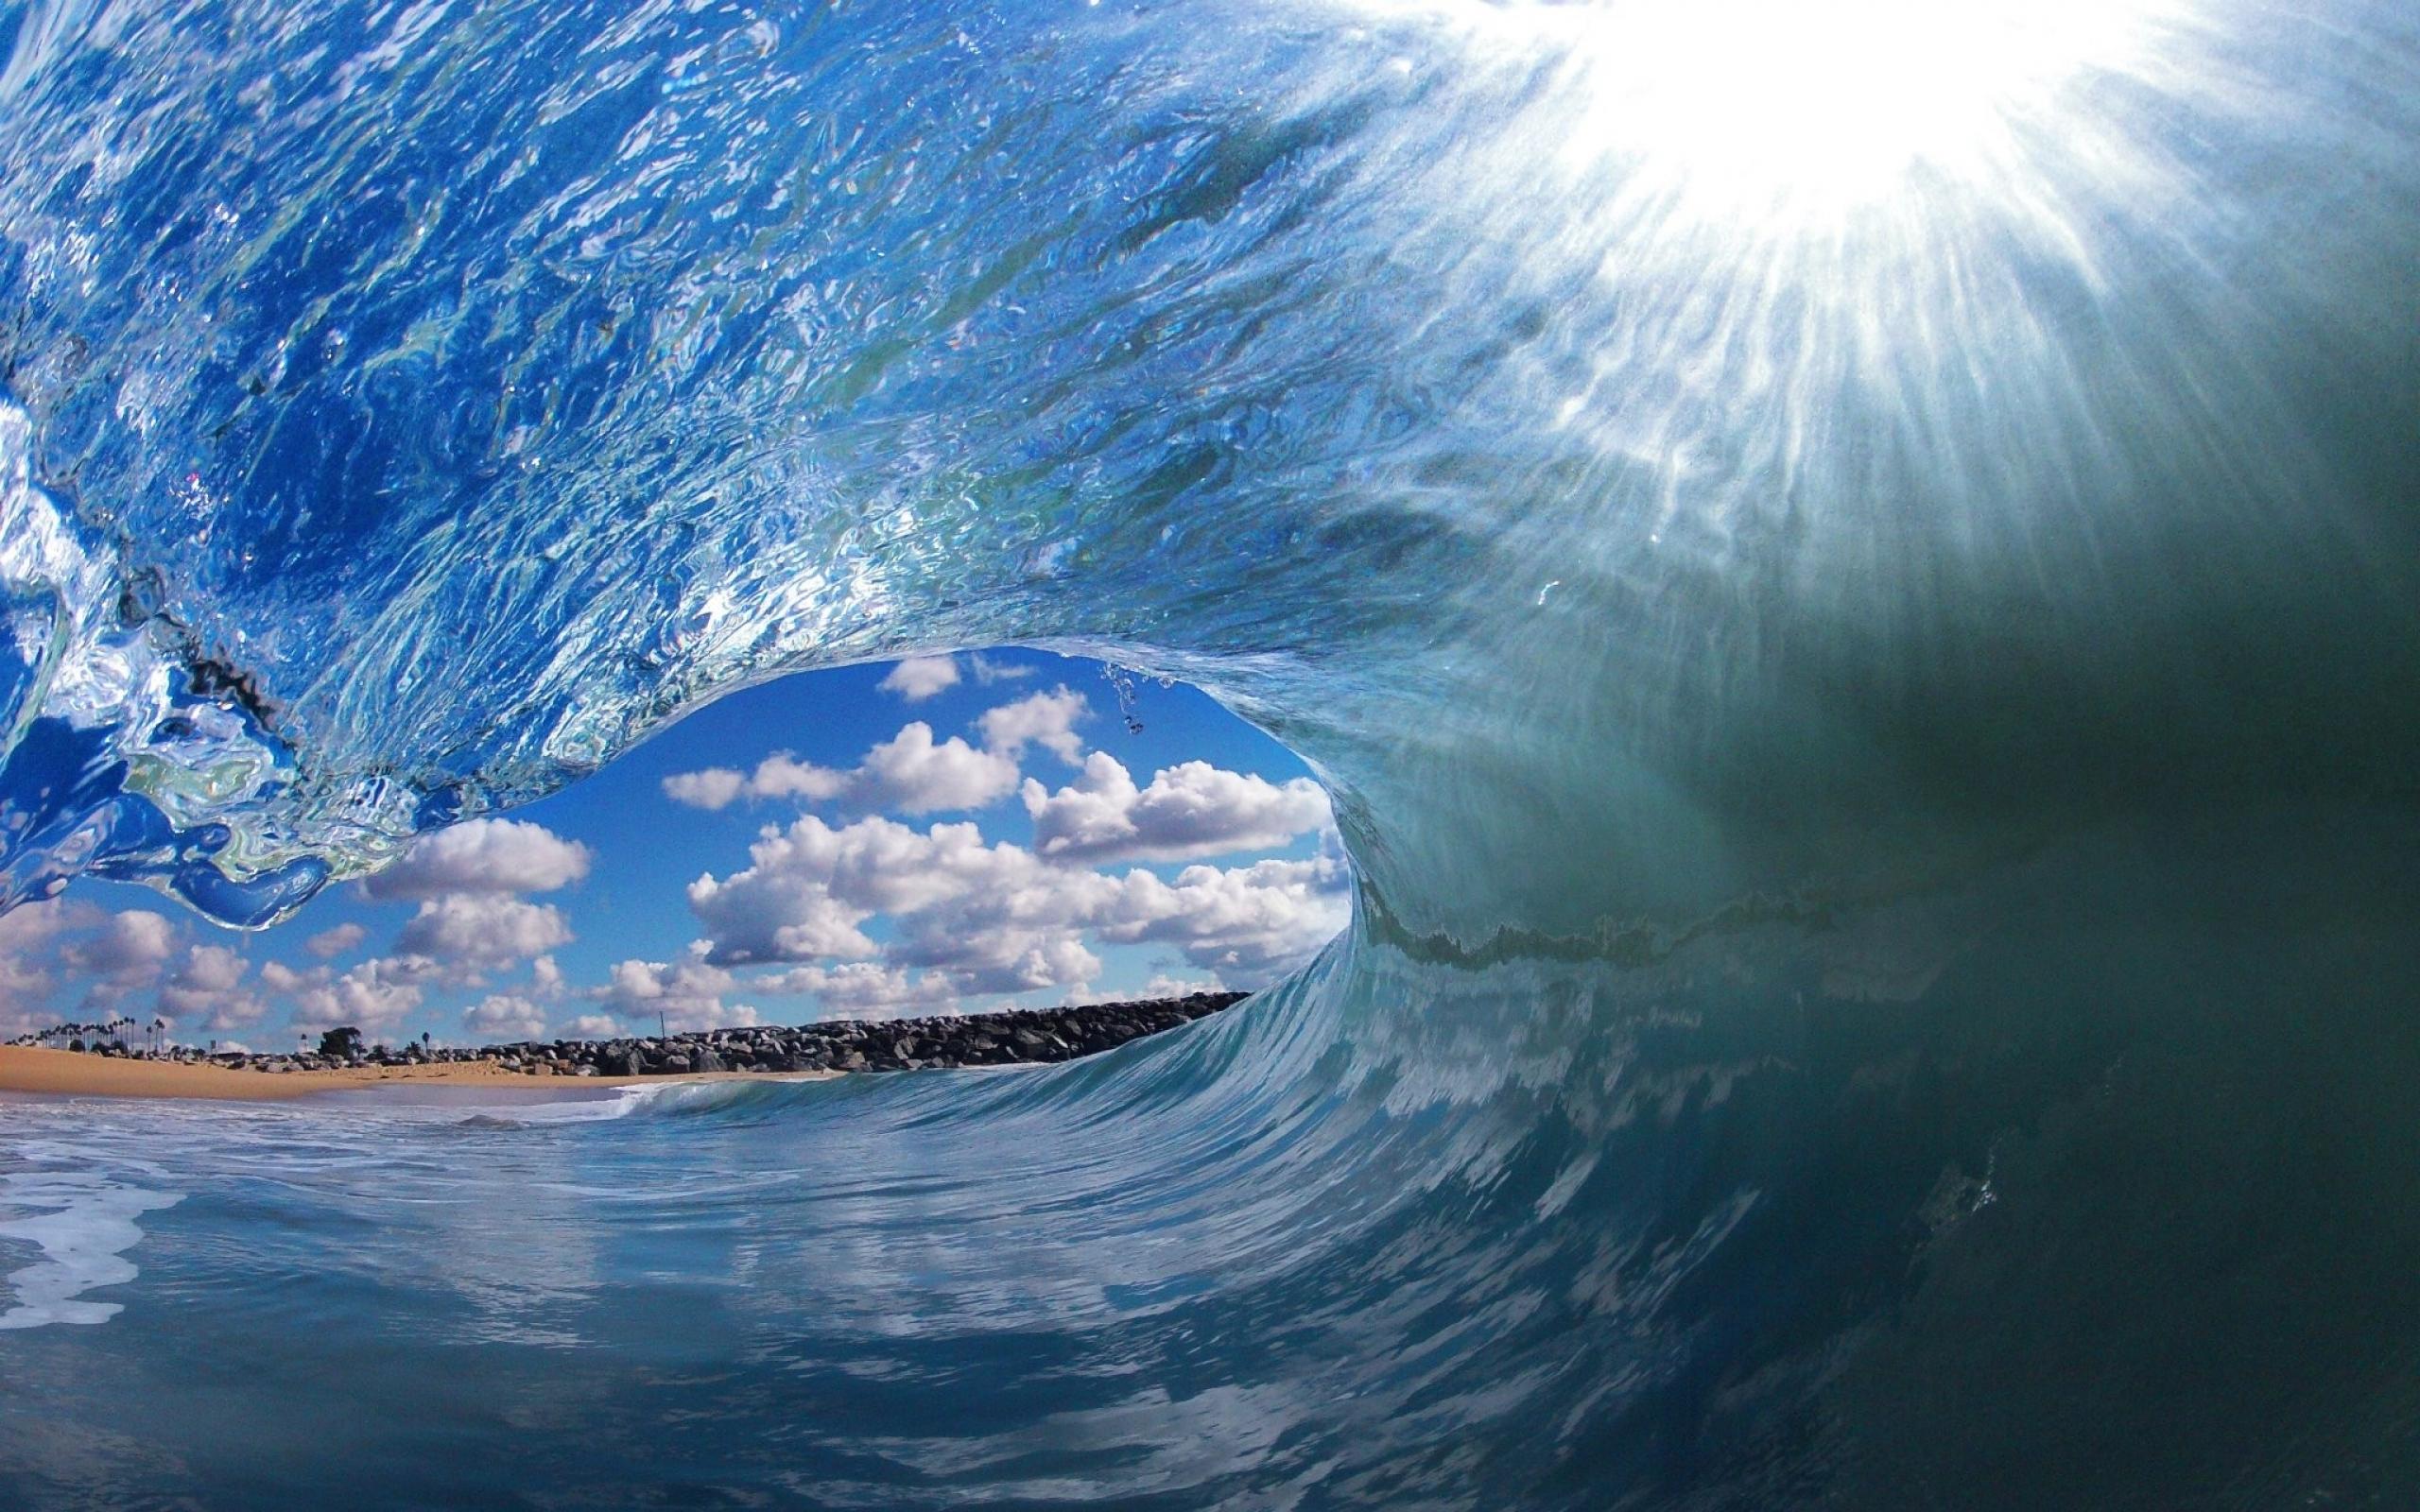 waves tropical clark little Wallpaper Wallpapers Download 2560x1600